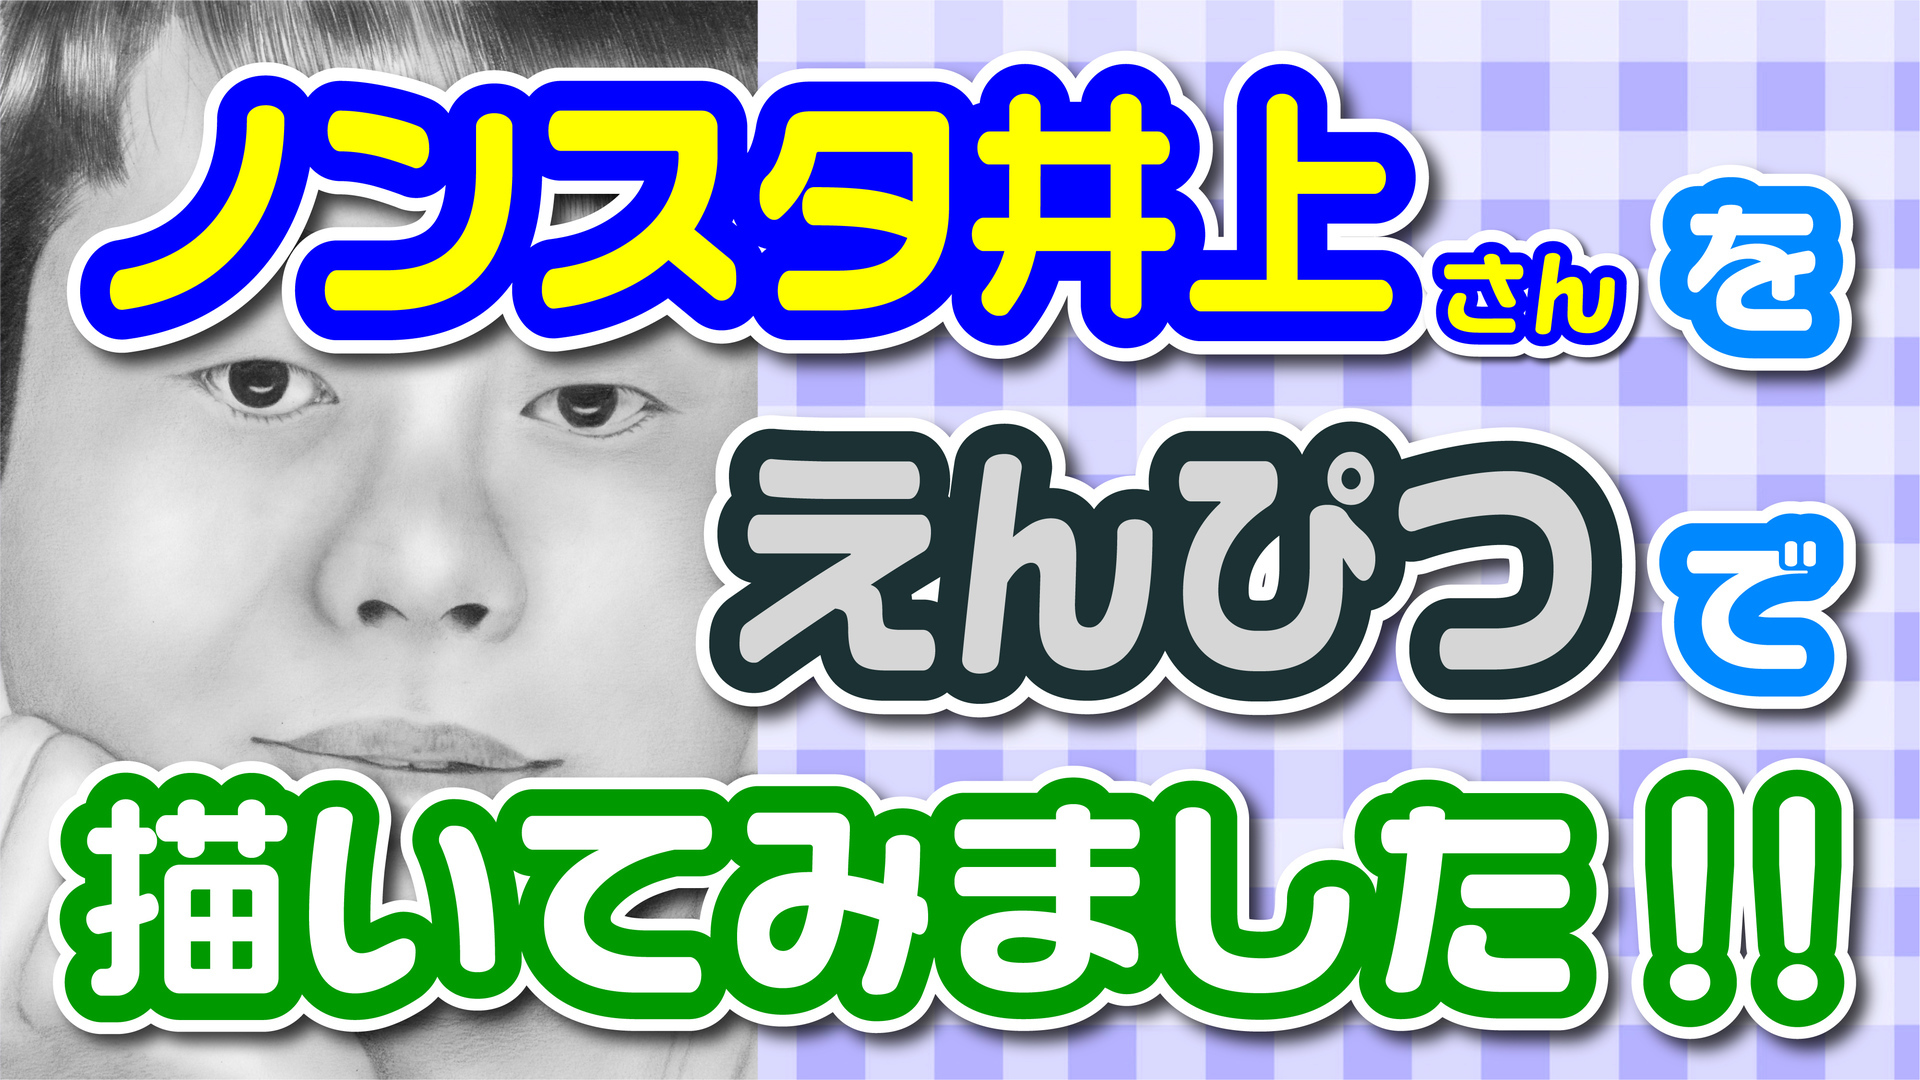 Youtubeサムネイル 井上鉛筆画.jpg